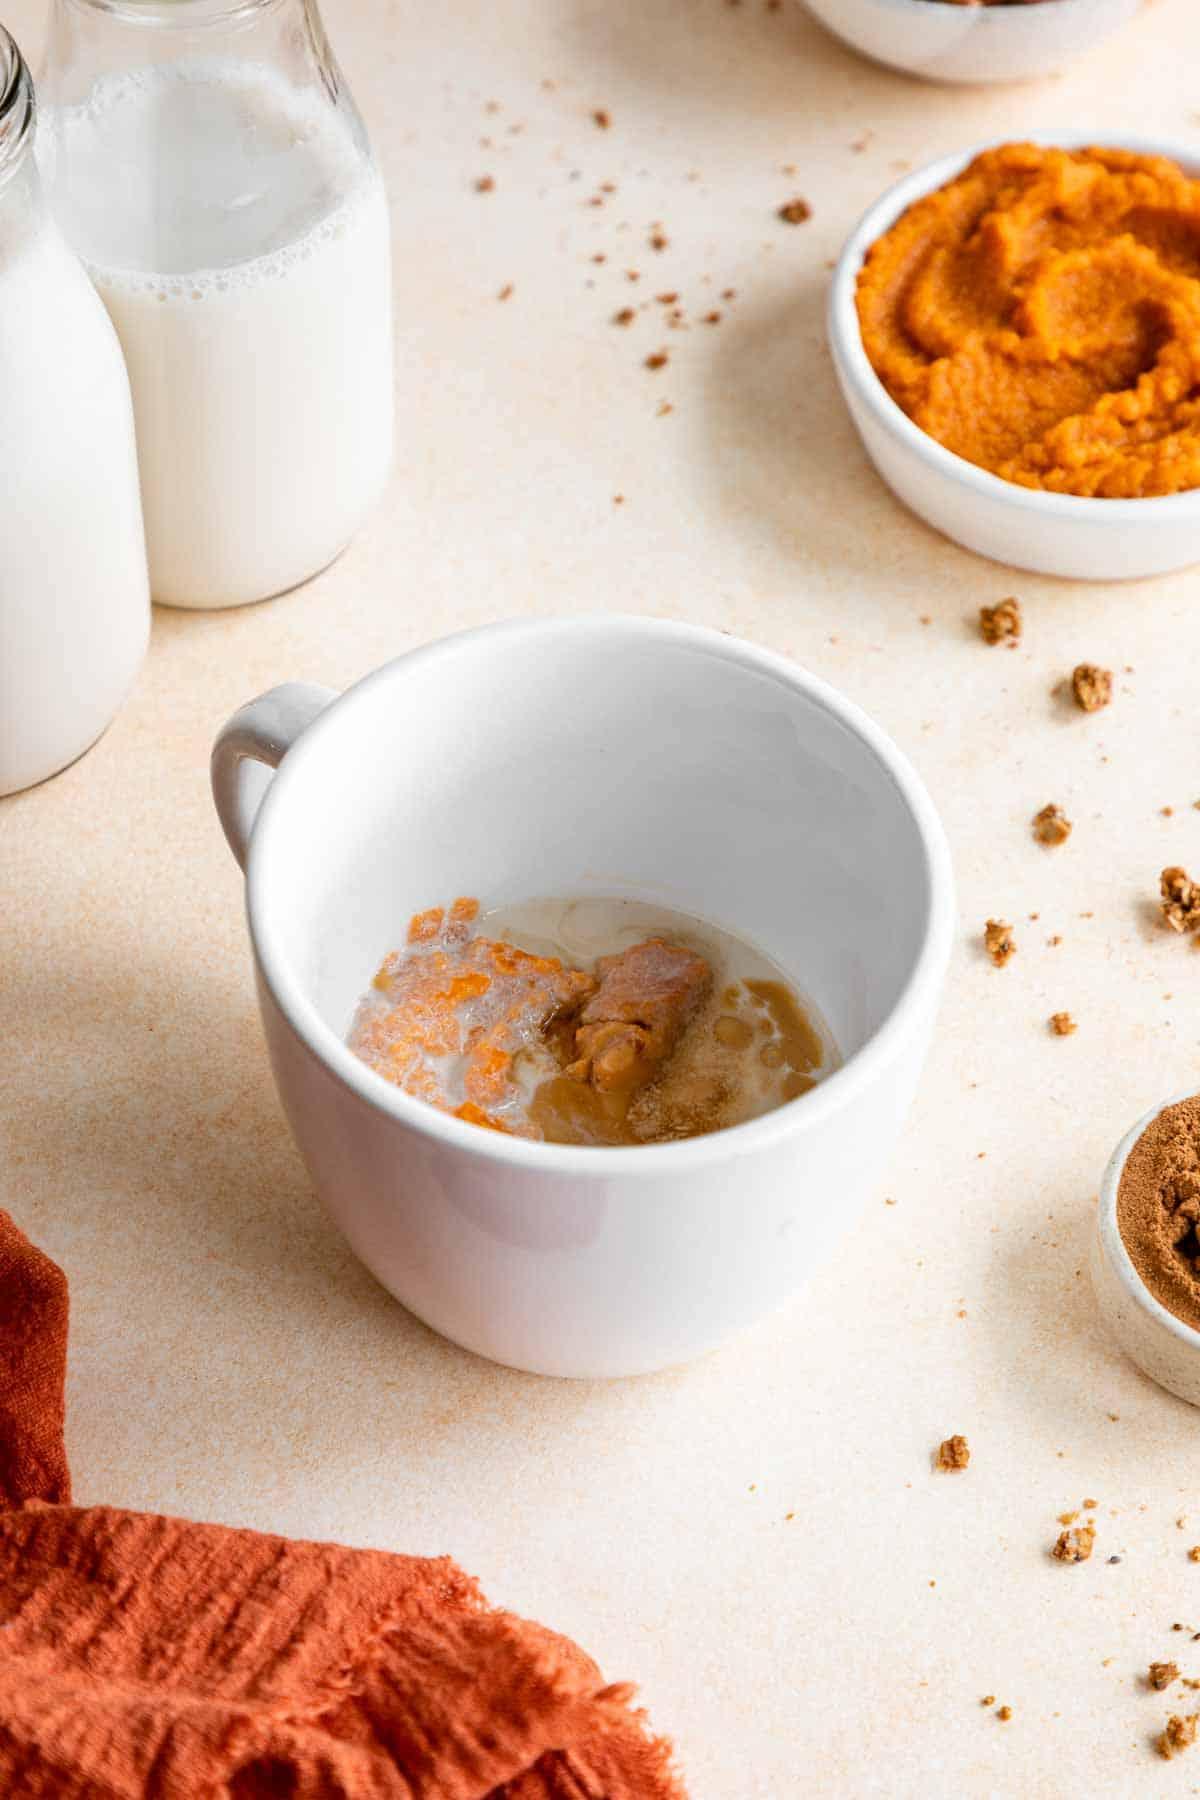 pumpkin puree, oat flour, almond milk, and almond butter in a white mug